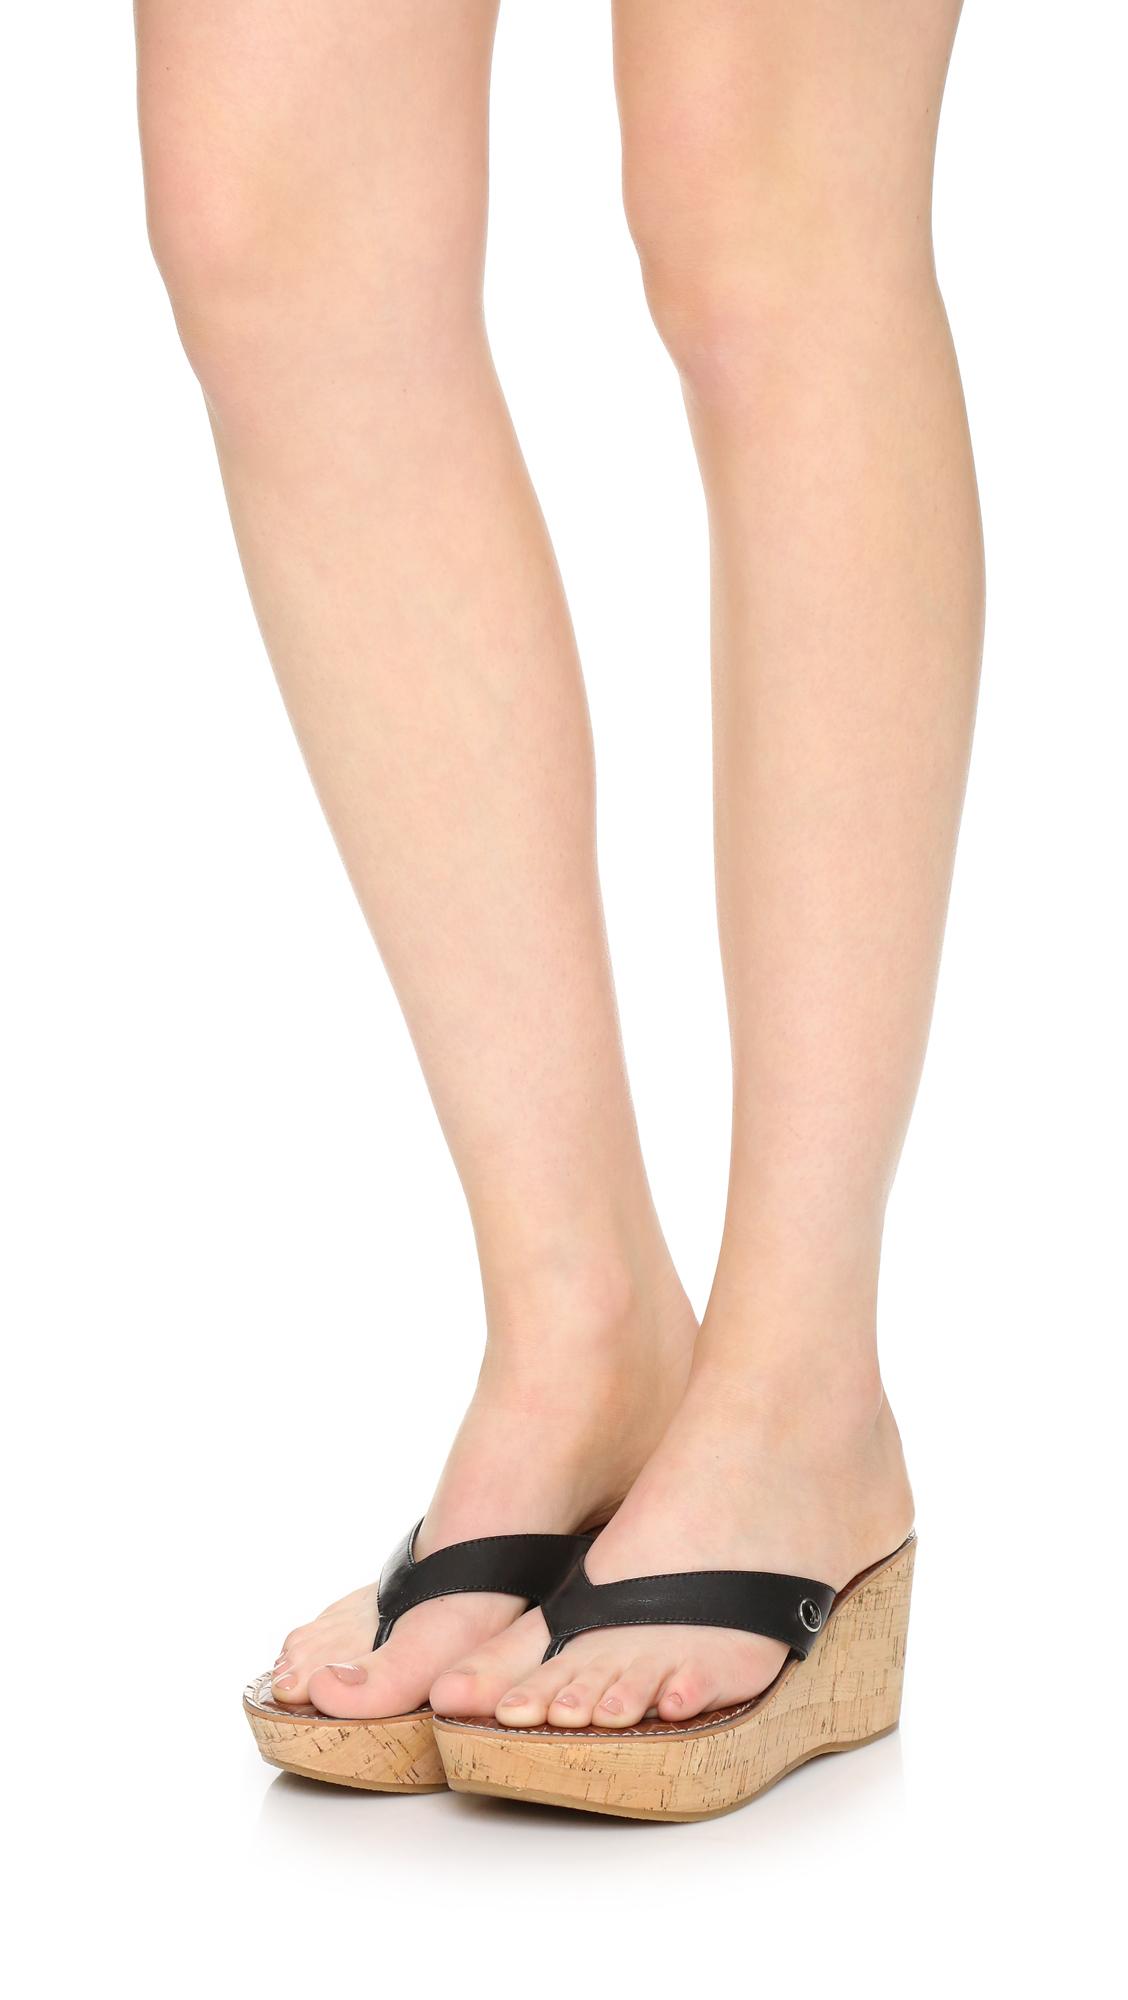 33a4af5ae Sam Edelman Romy Wedge Thong Sandals in Black - Lyst